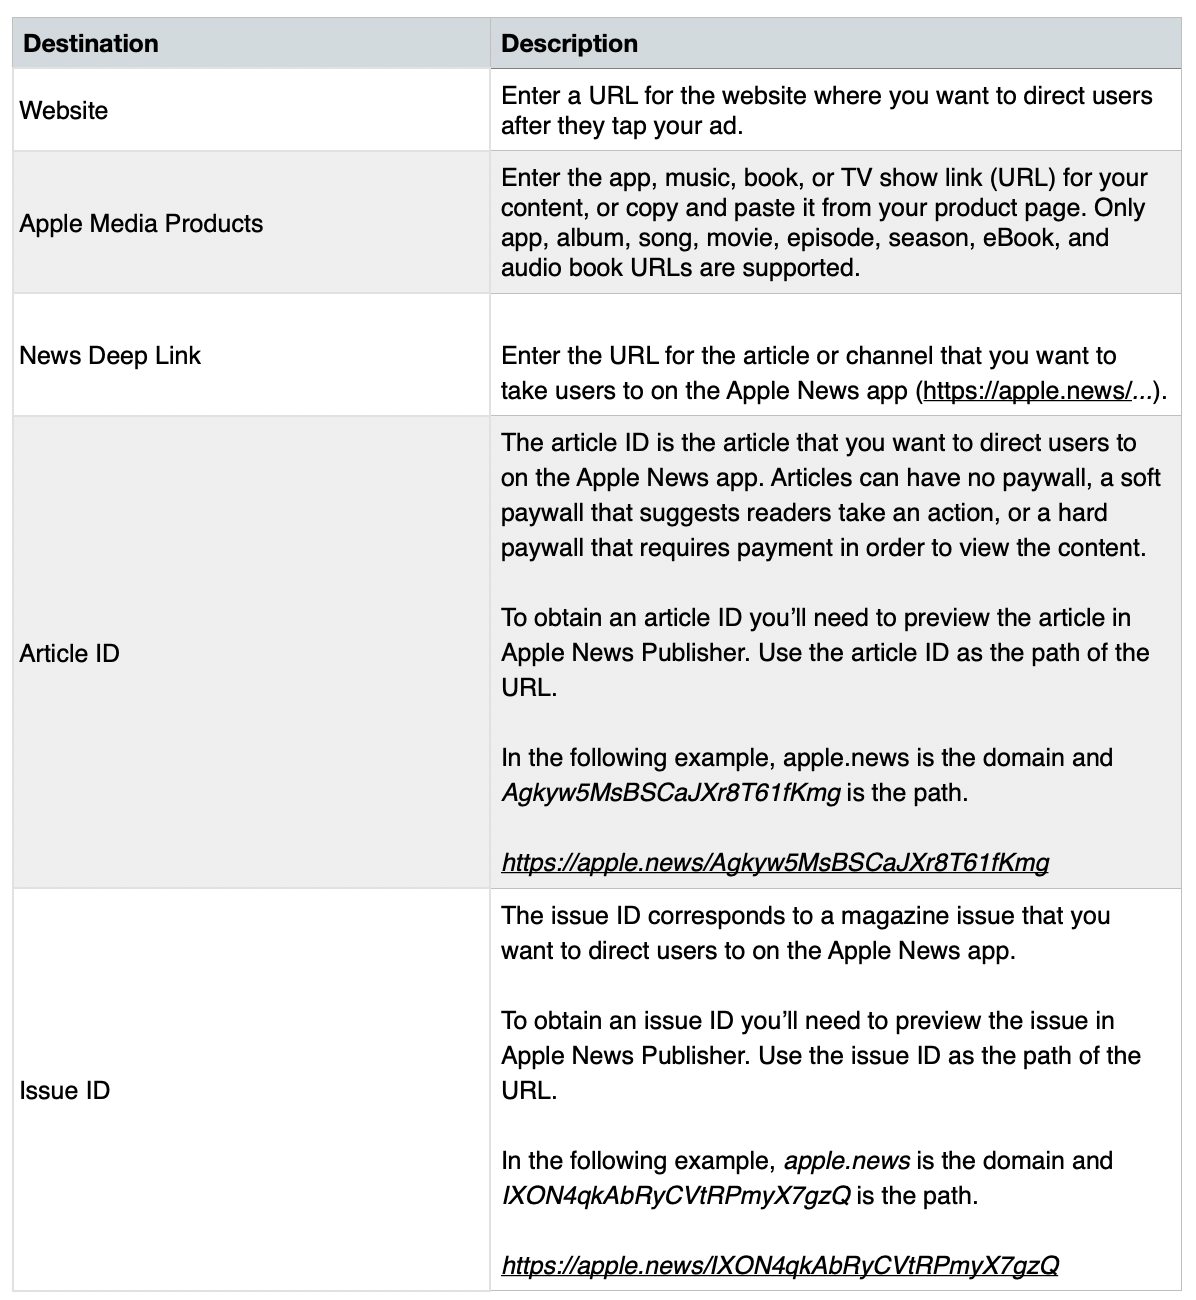 Ad destinations table 1